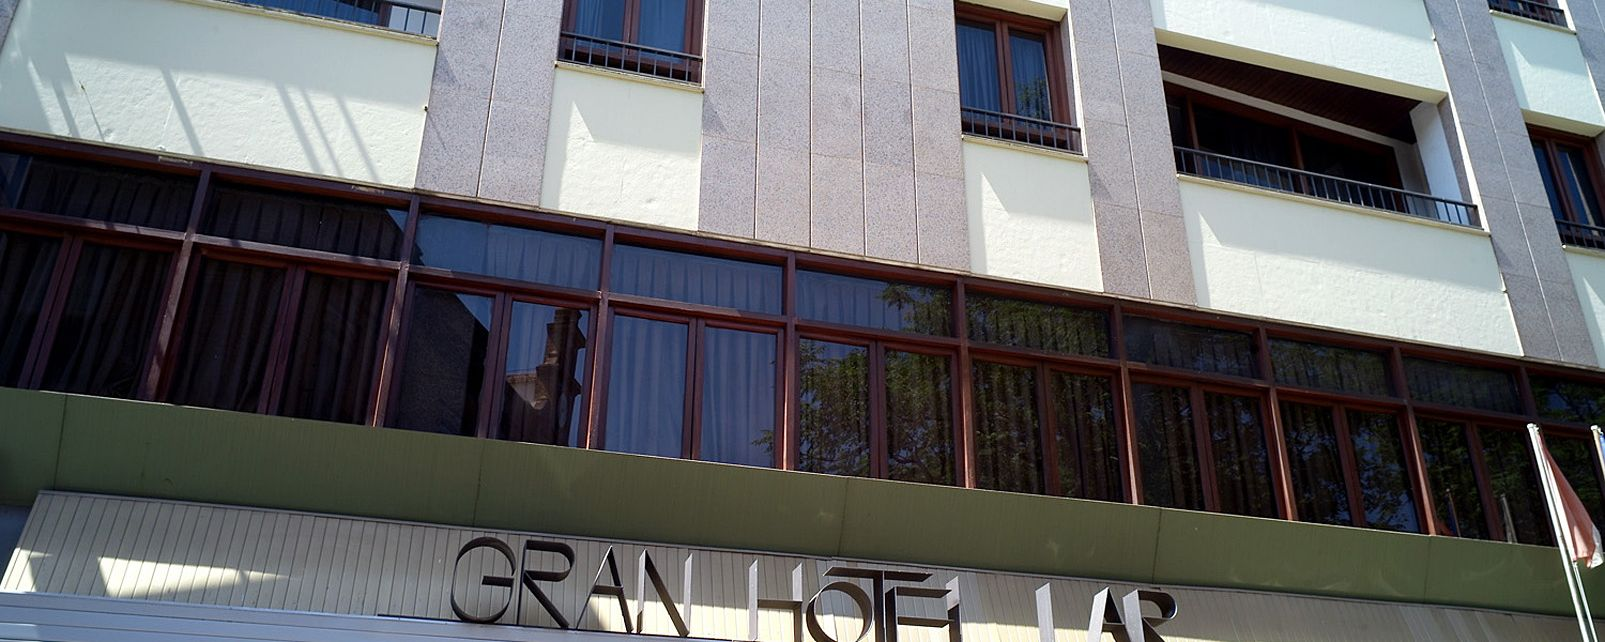 Hotel Gran Hotel Lar